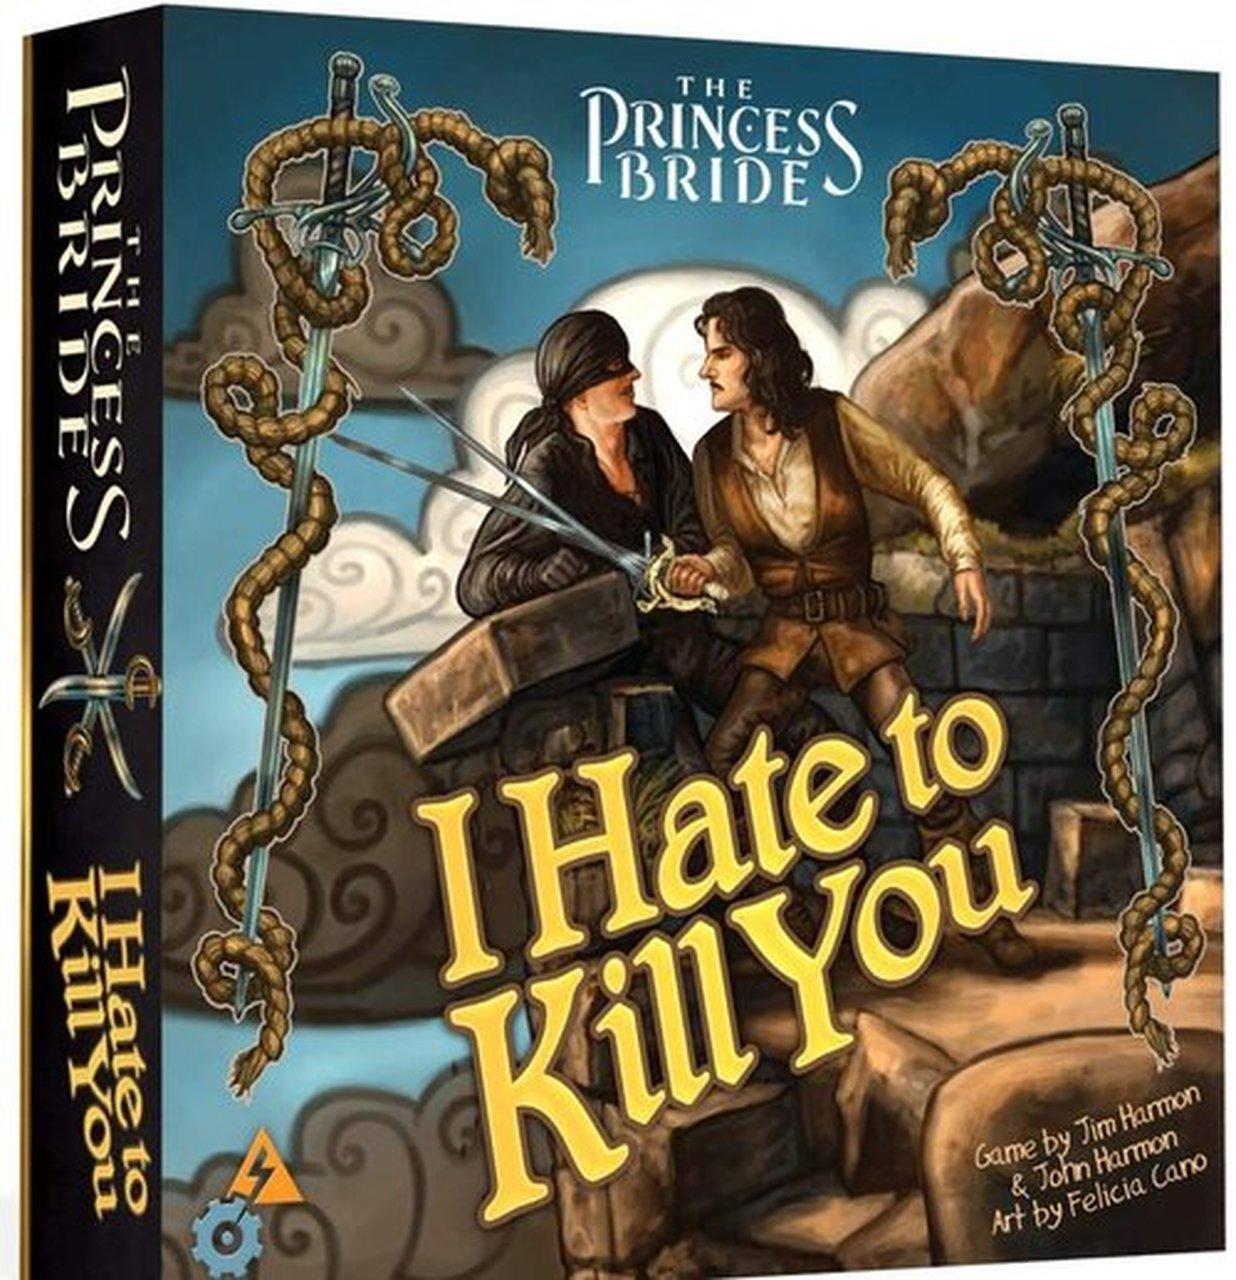 The Princess Bride I Hate to Kill You